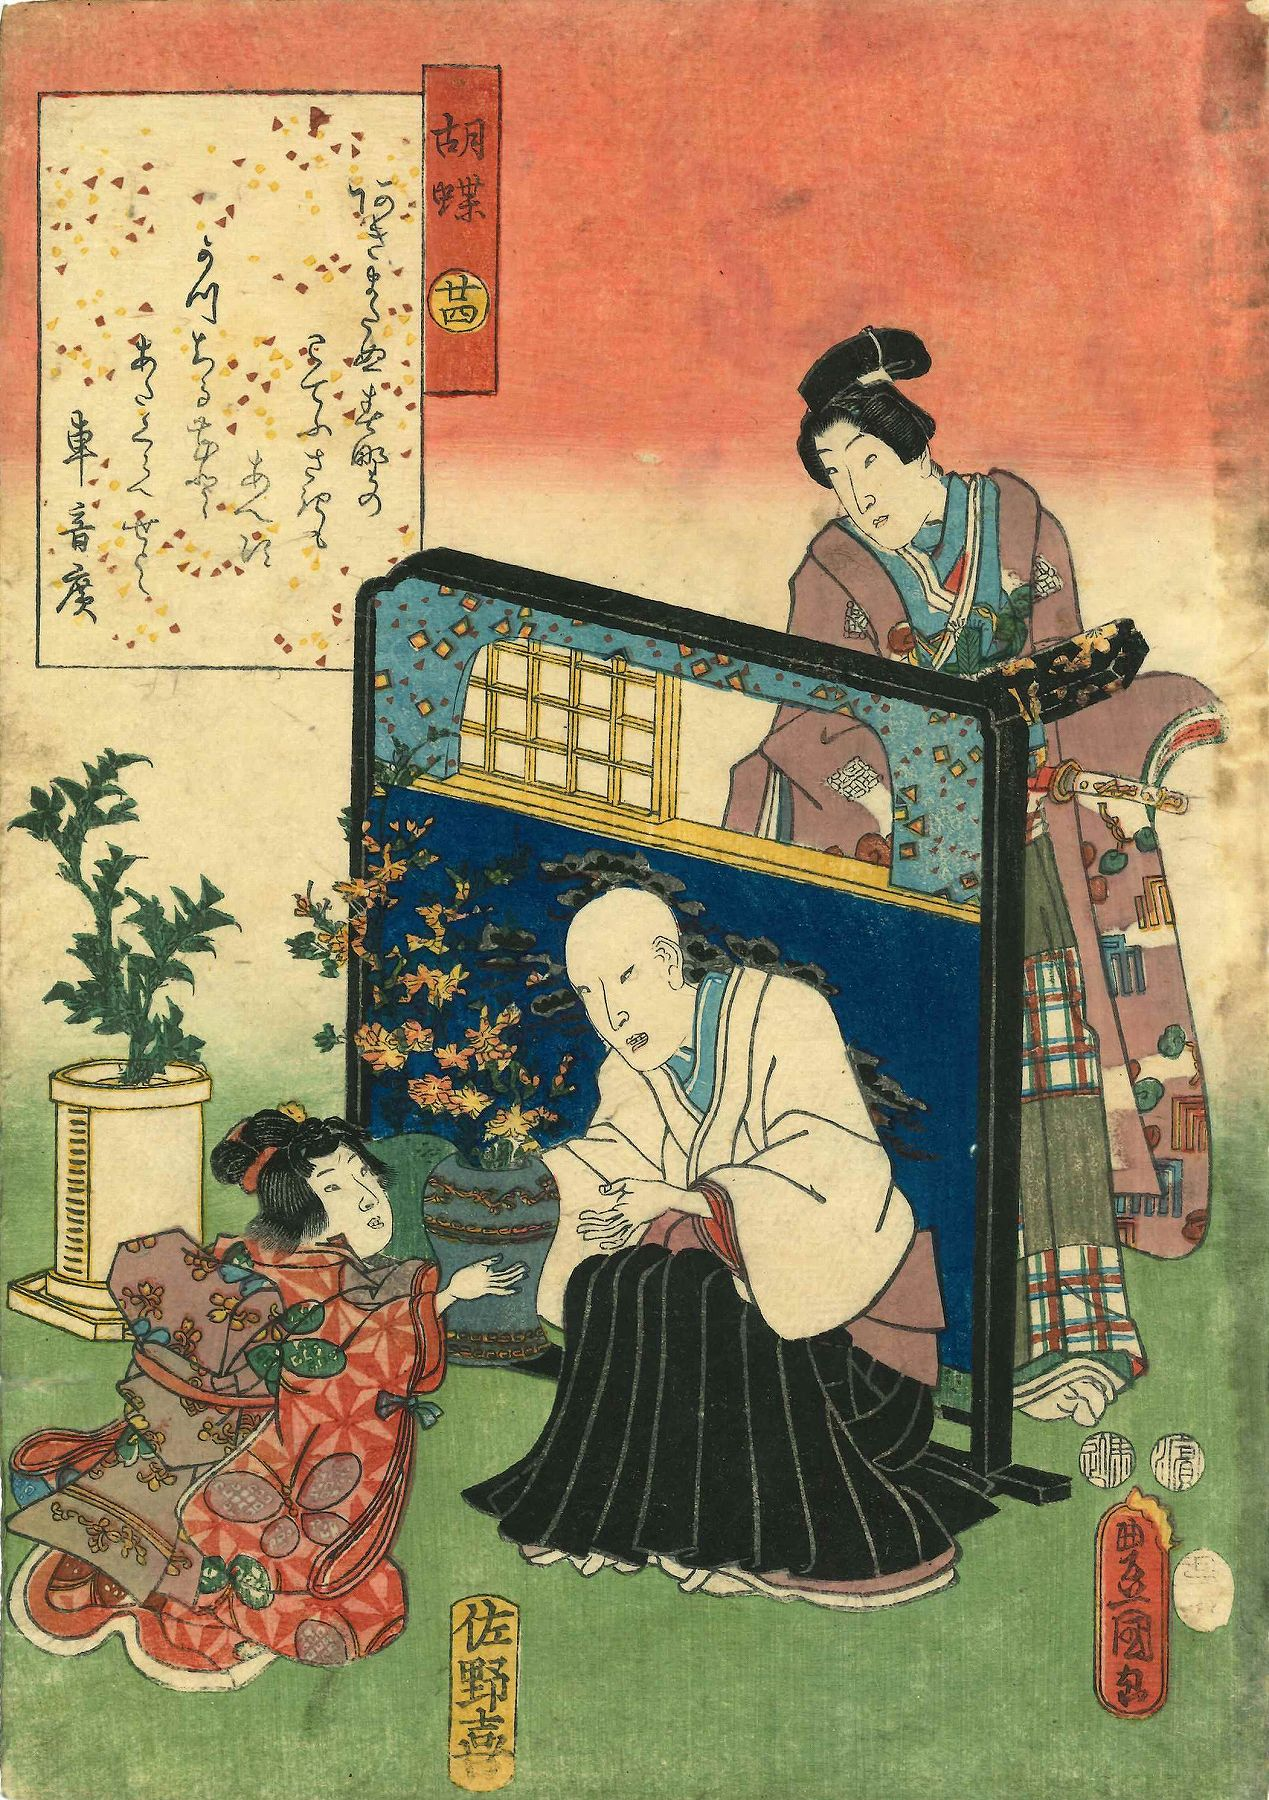 TOYOKUNI III Chapter 24, Kocho, from Genji monogatari (Tale of Genji)